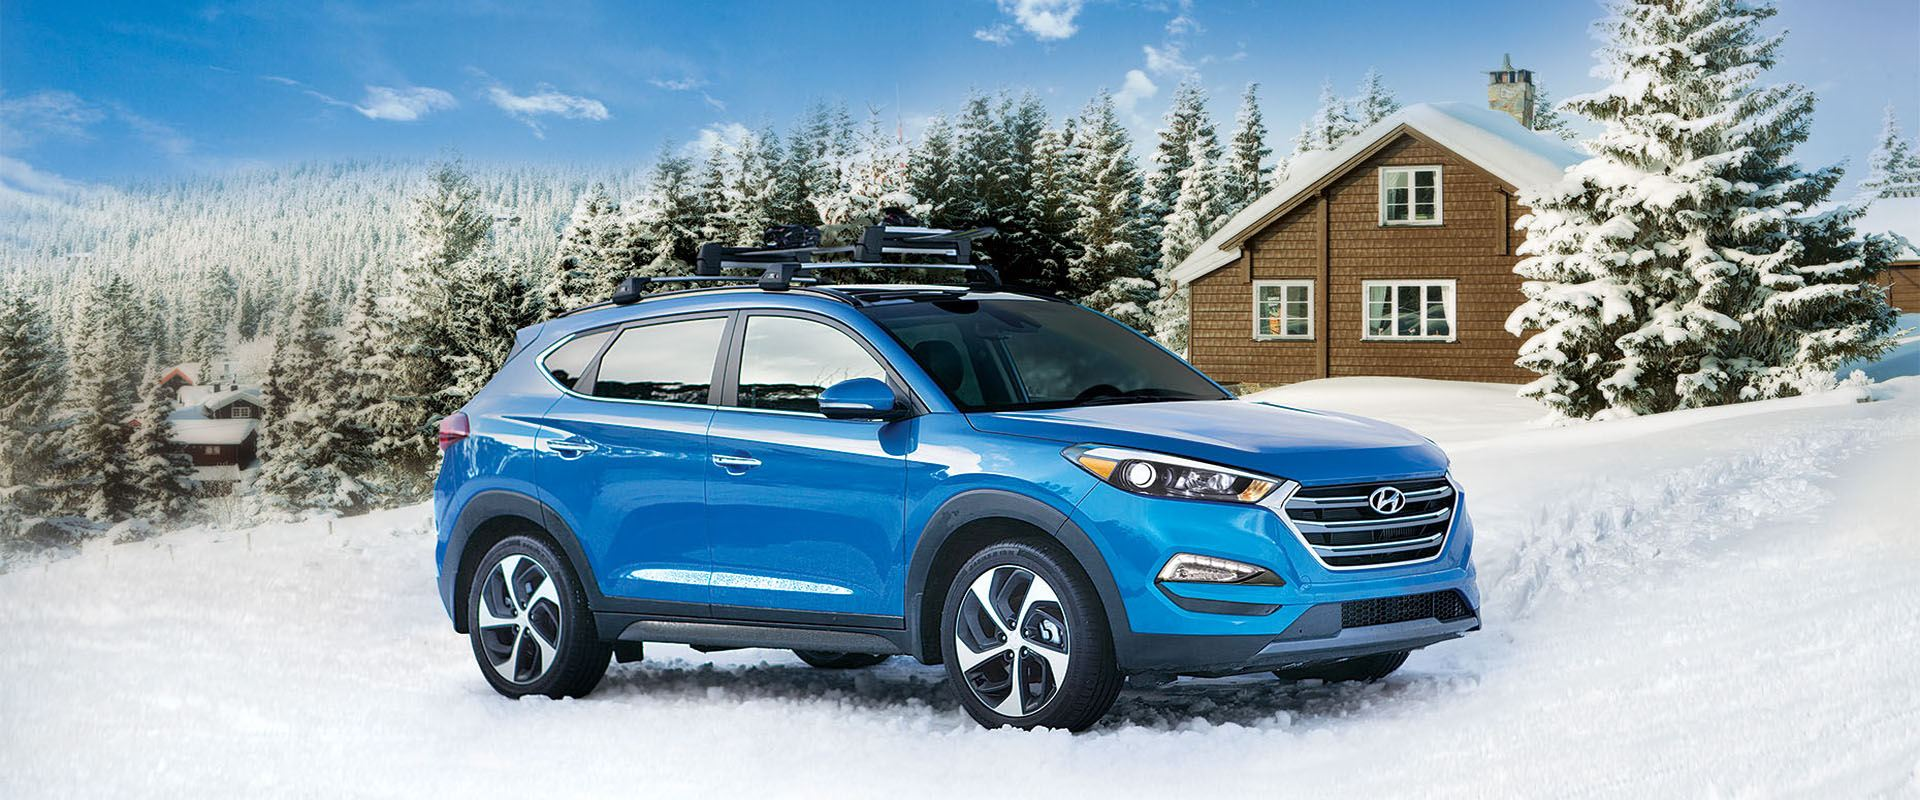 Discover the 2020 Hyundai Tucson at Pathway Hyundai in Ottawa ON